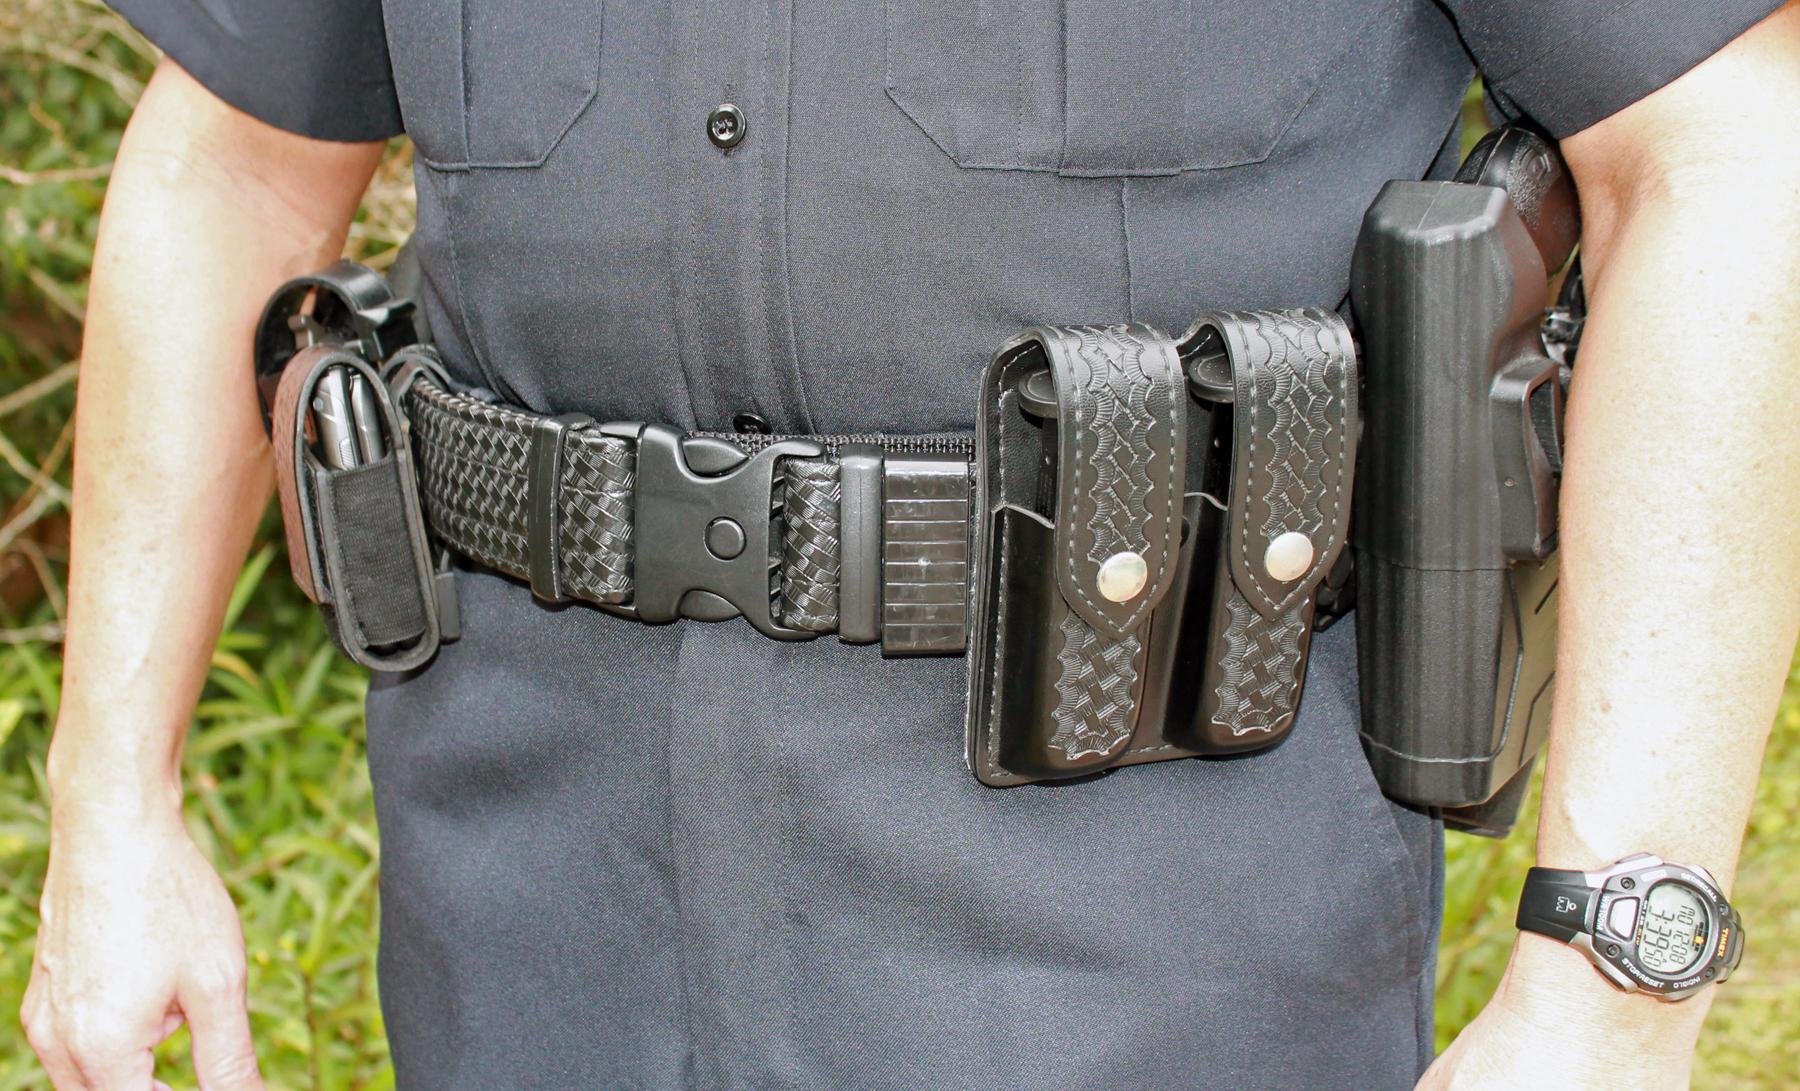 Magnetactical Uniform wear